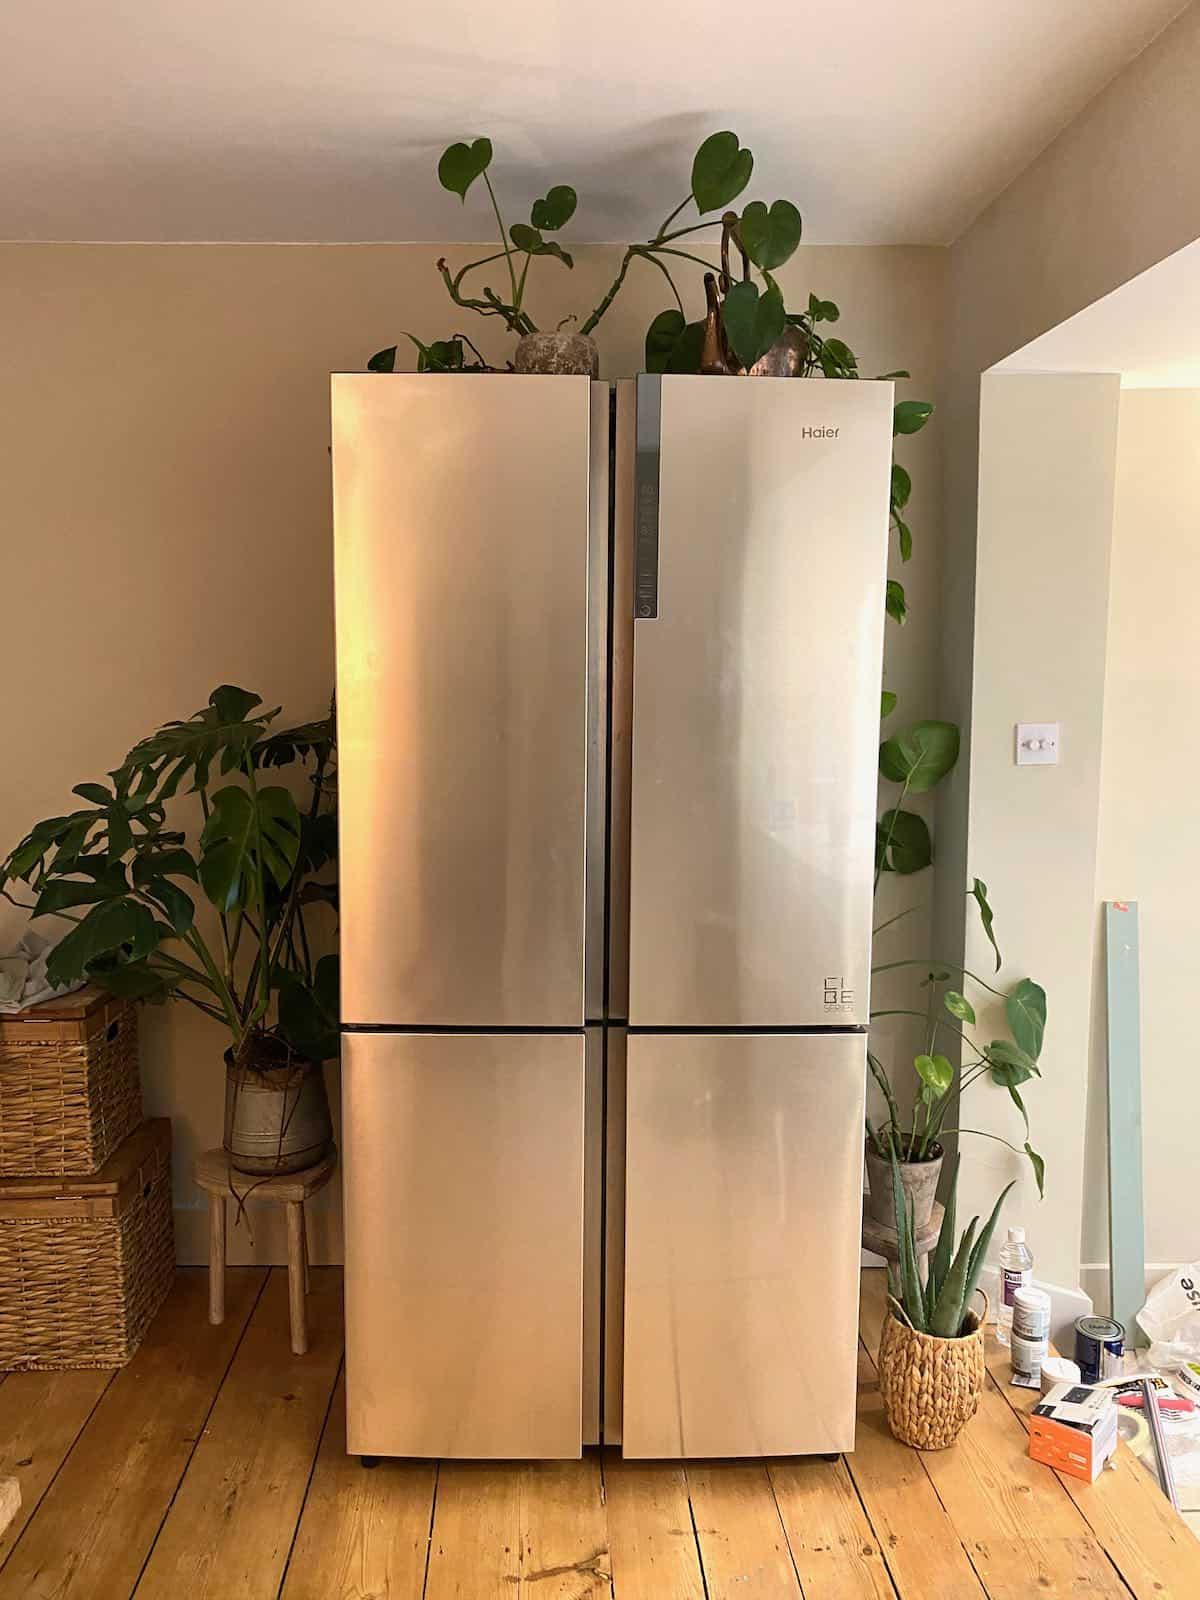 Multi-door fridge freezer with plants around it